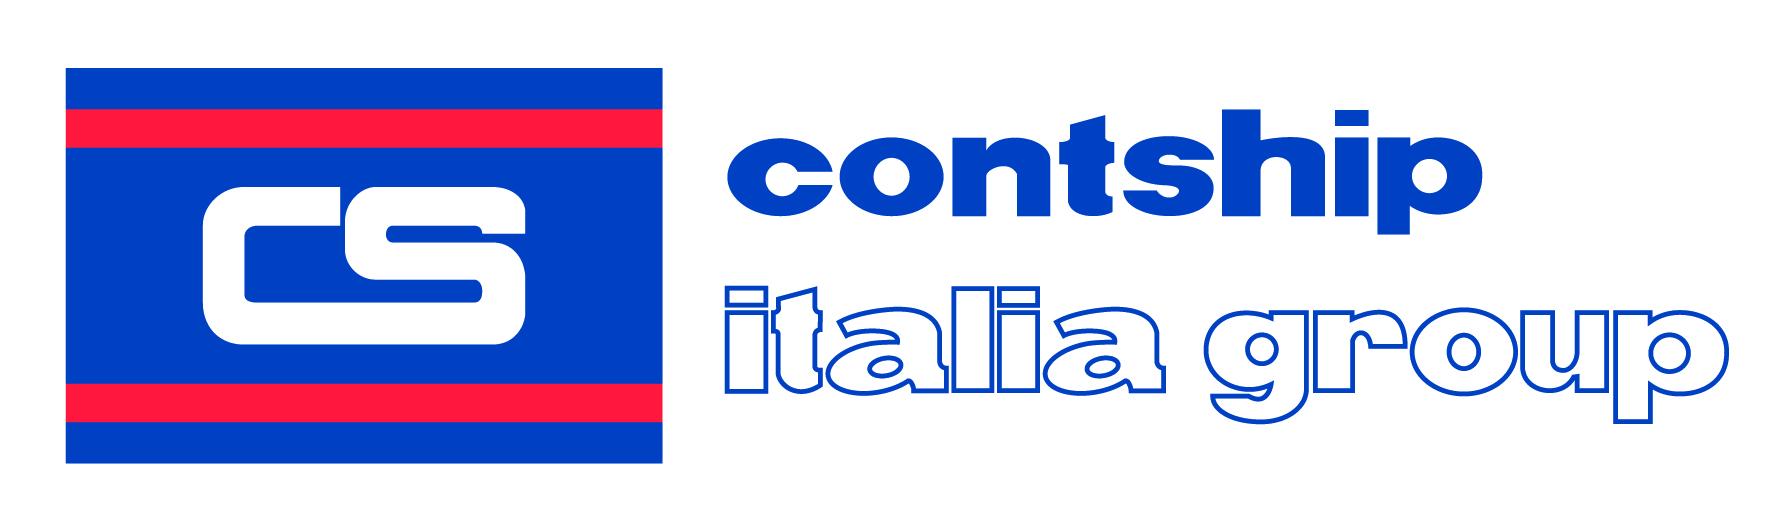 CS_ITALIA_GROUP_band-01.jpg